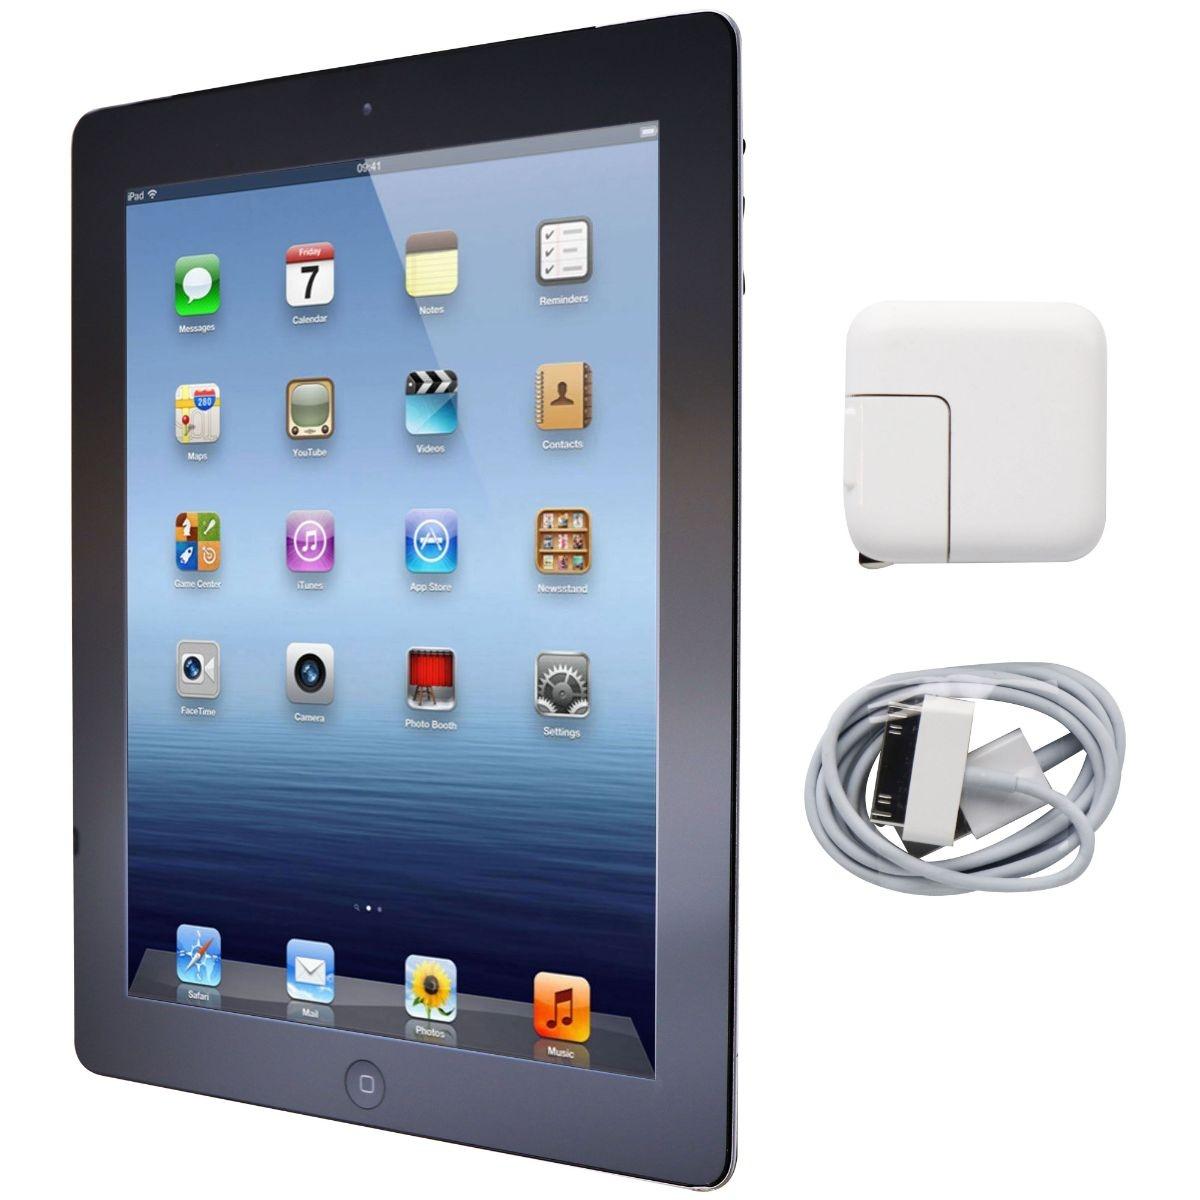 Apple iPad 9.7 (3rd Gen) Tablet A1403 (GSM Unlocked + Verizon) - 32GB / Black